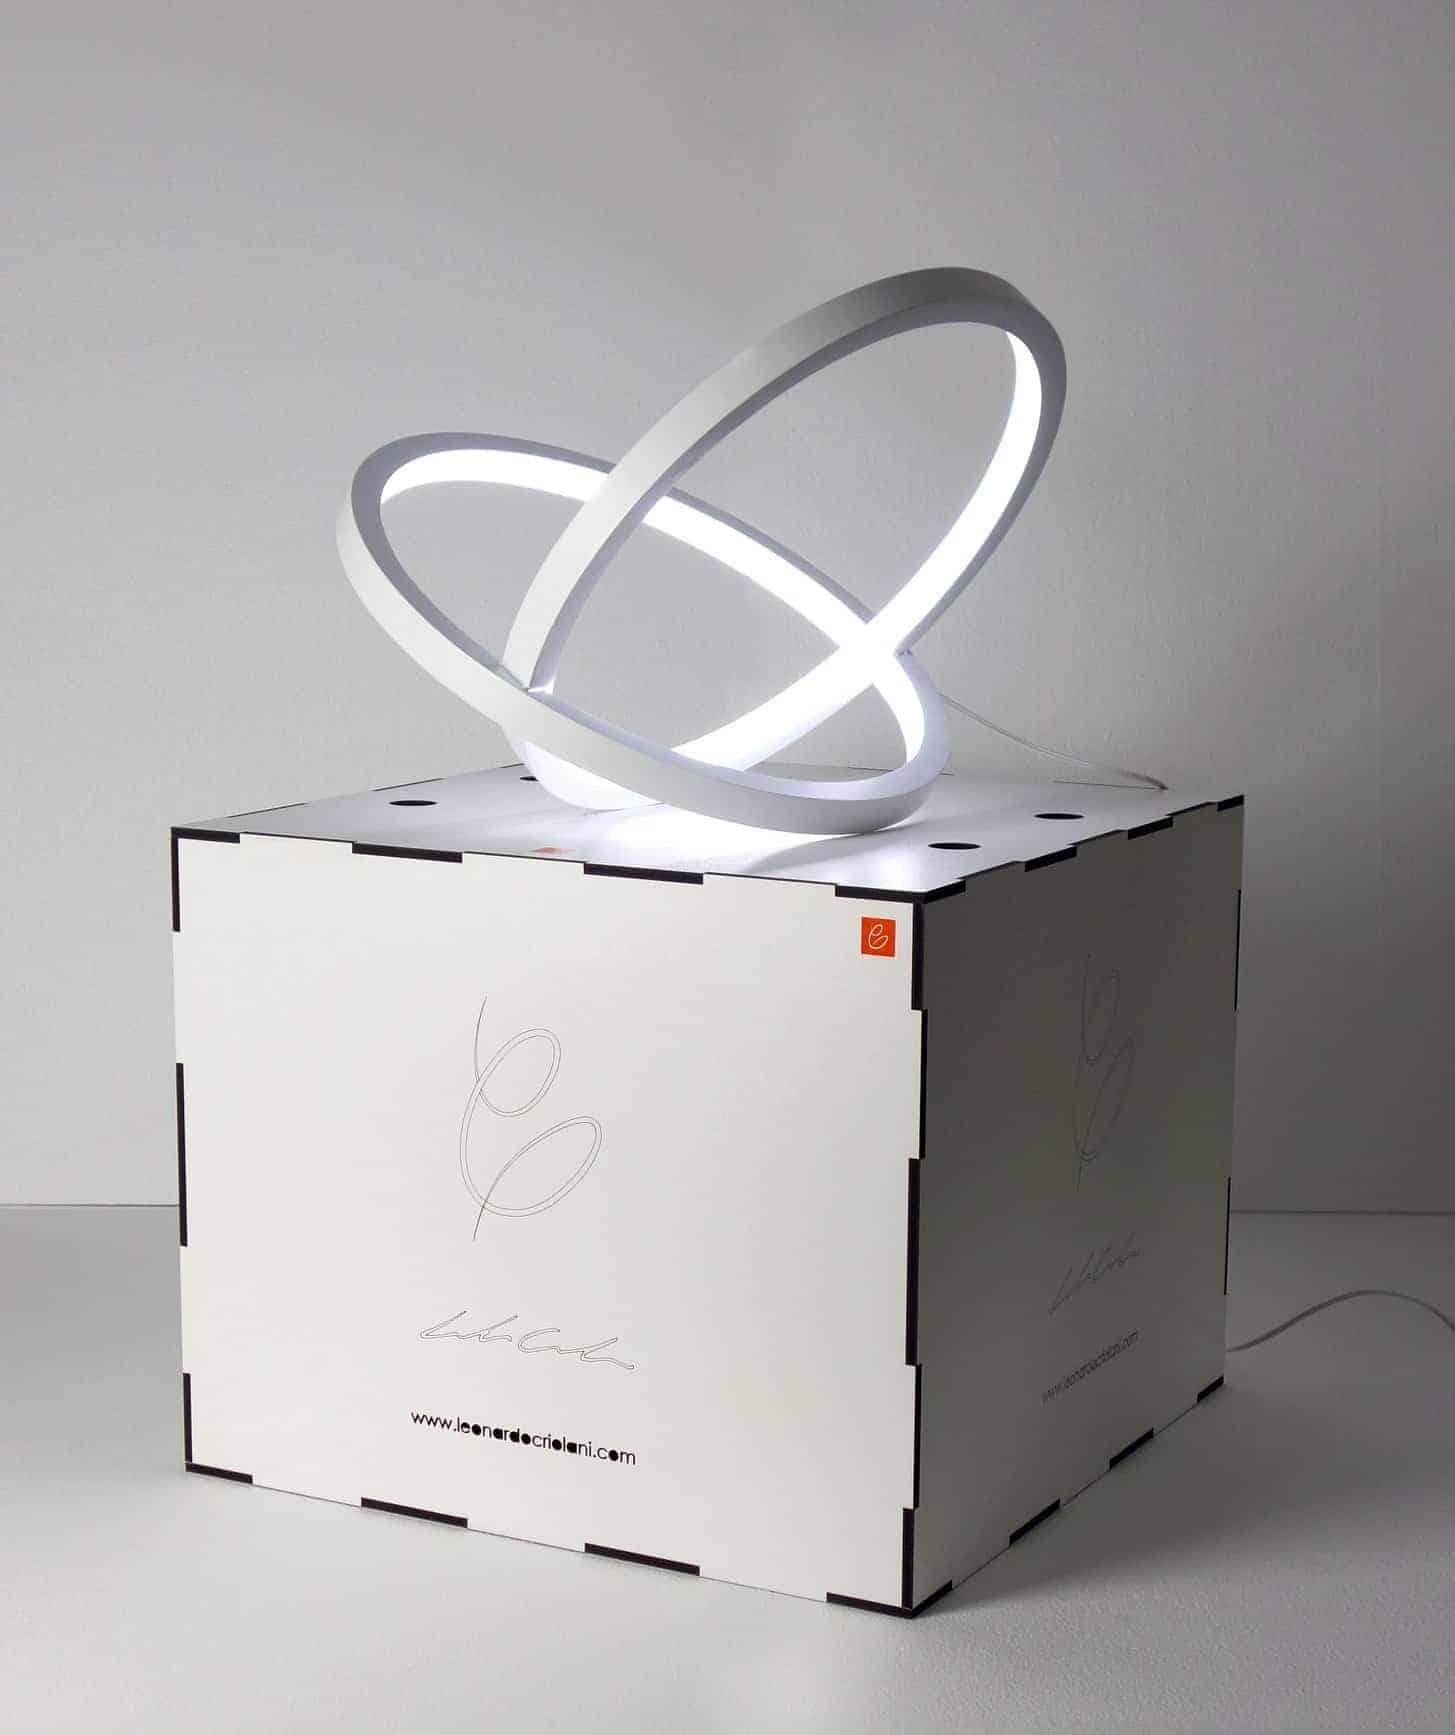 INFINITY - sculptural lamp & packaging